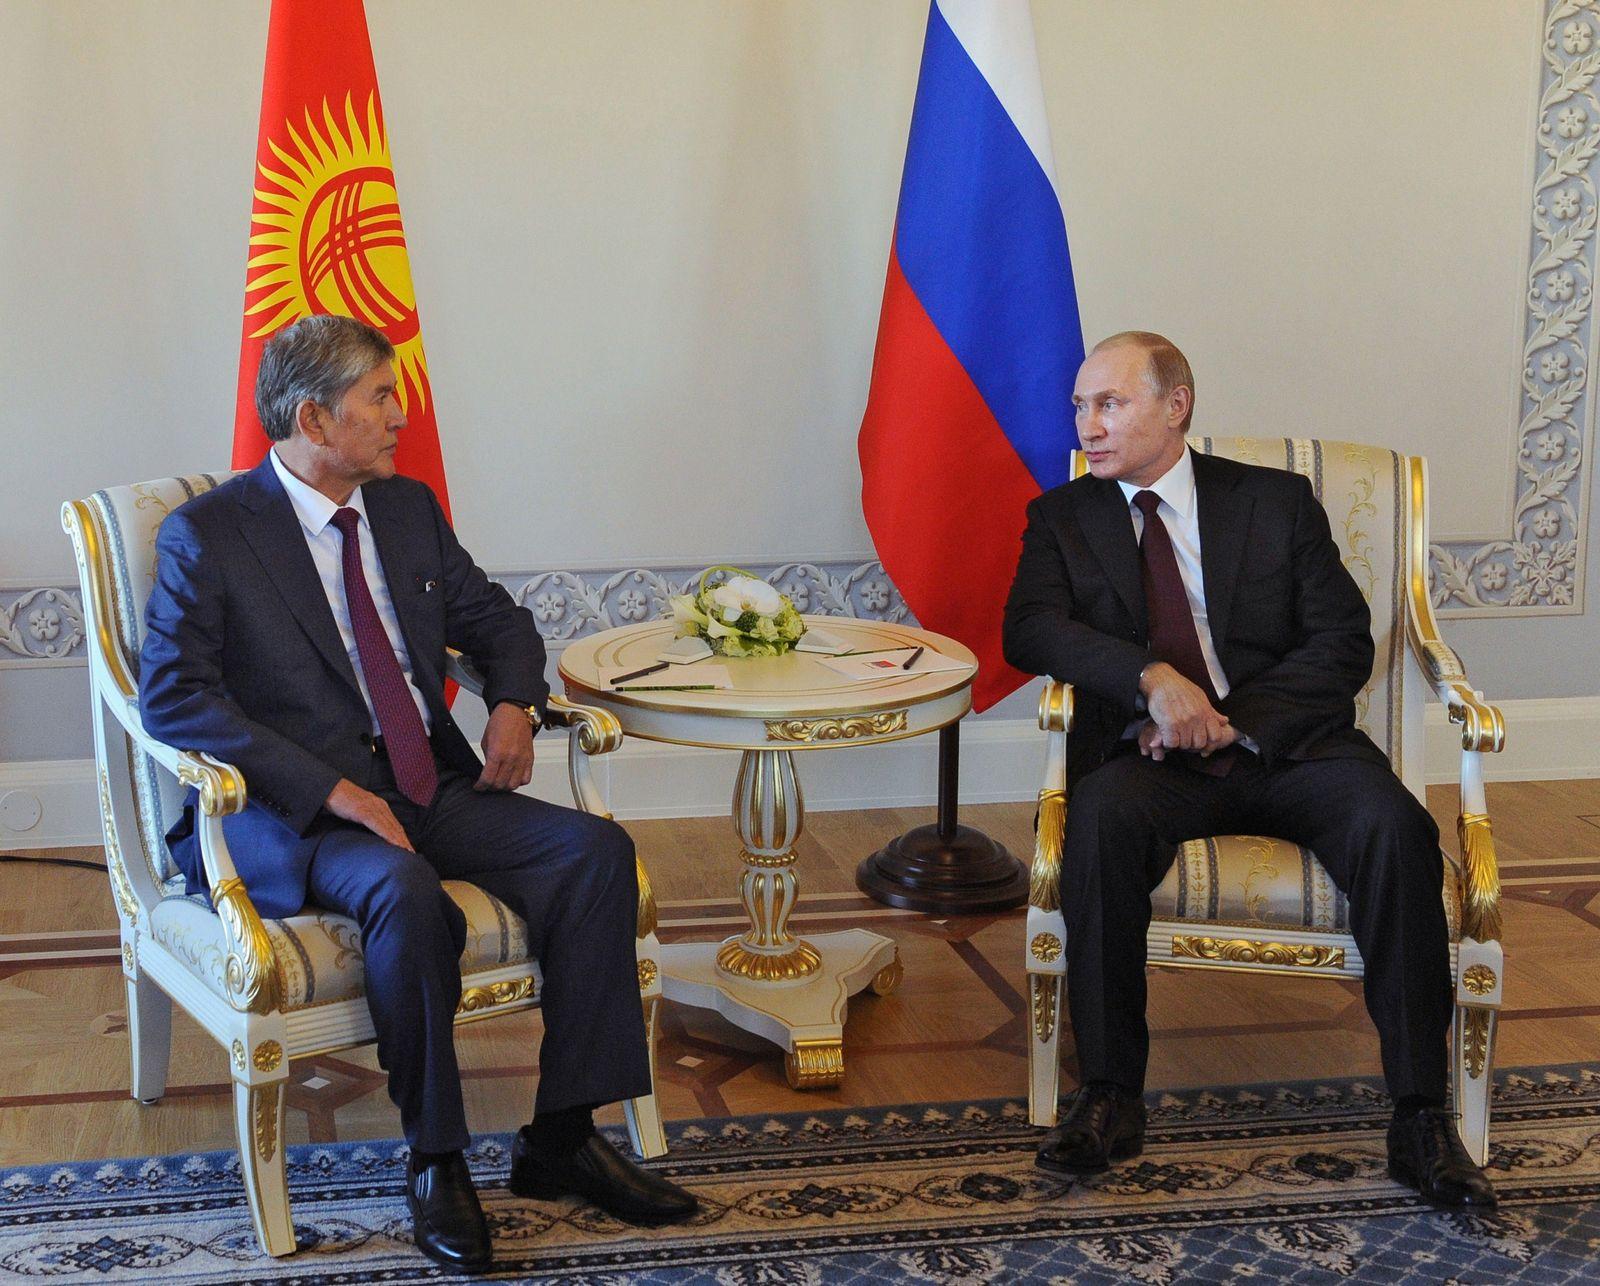 Putin / Atambayev